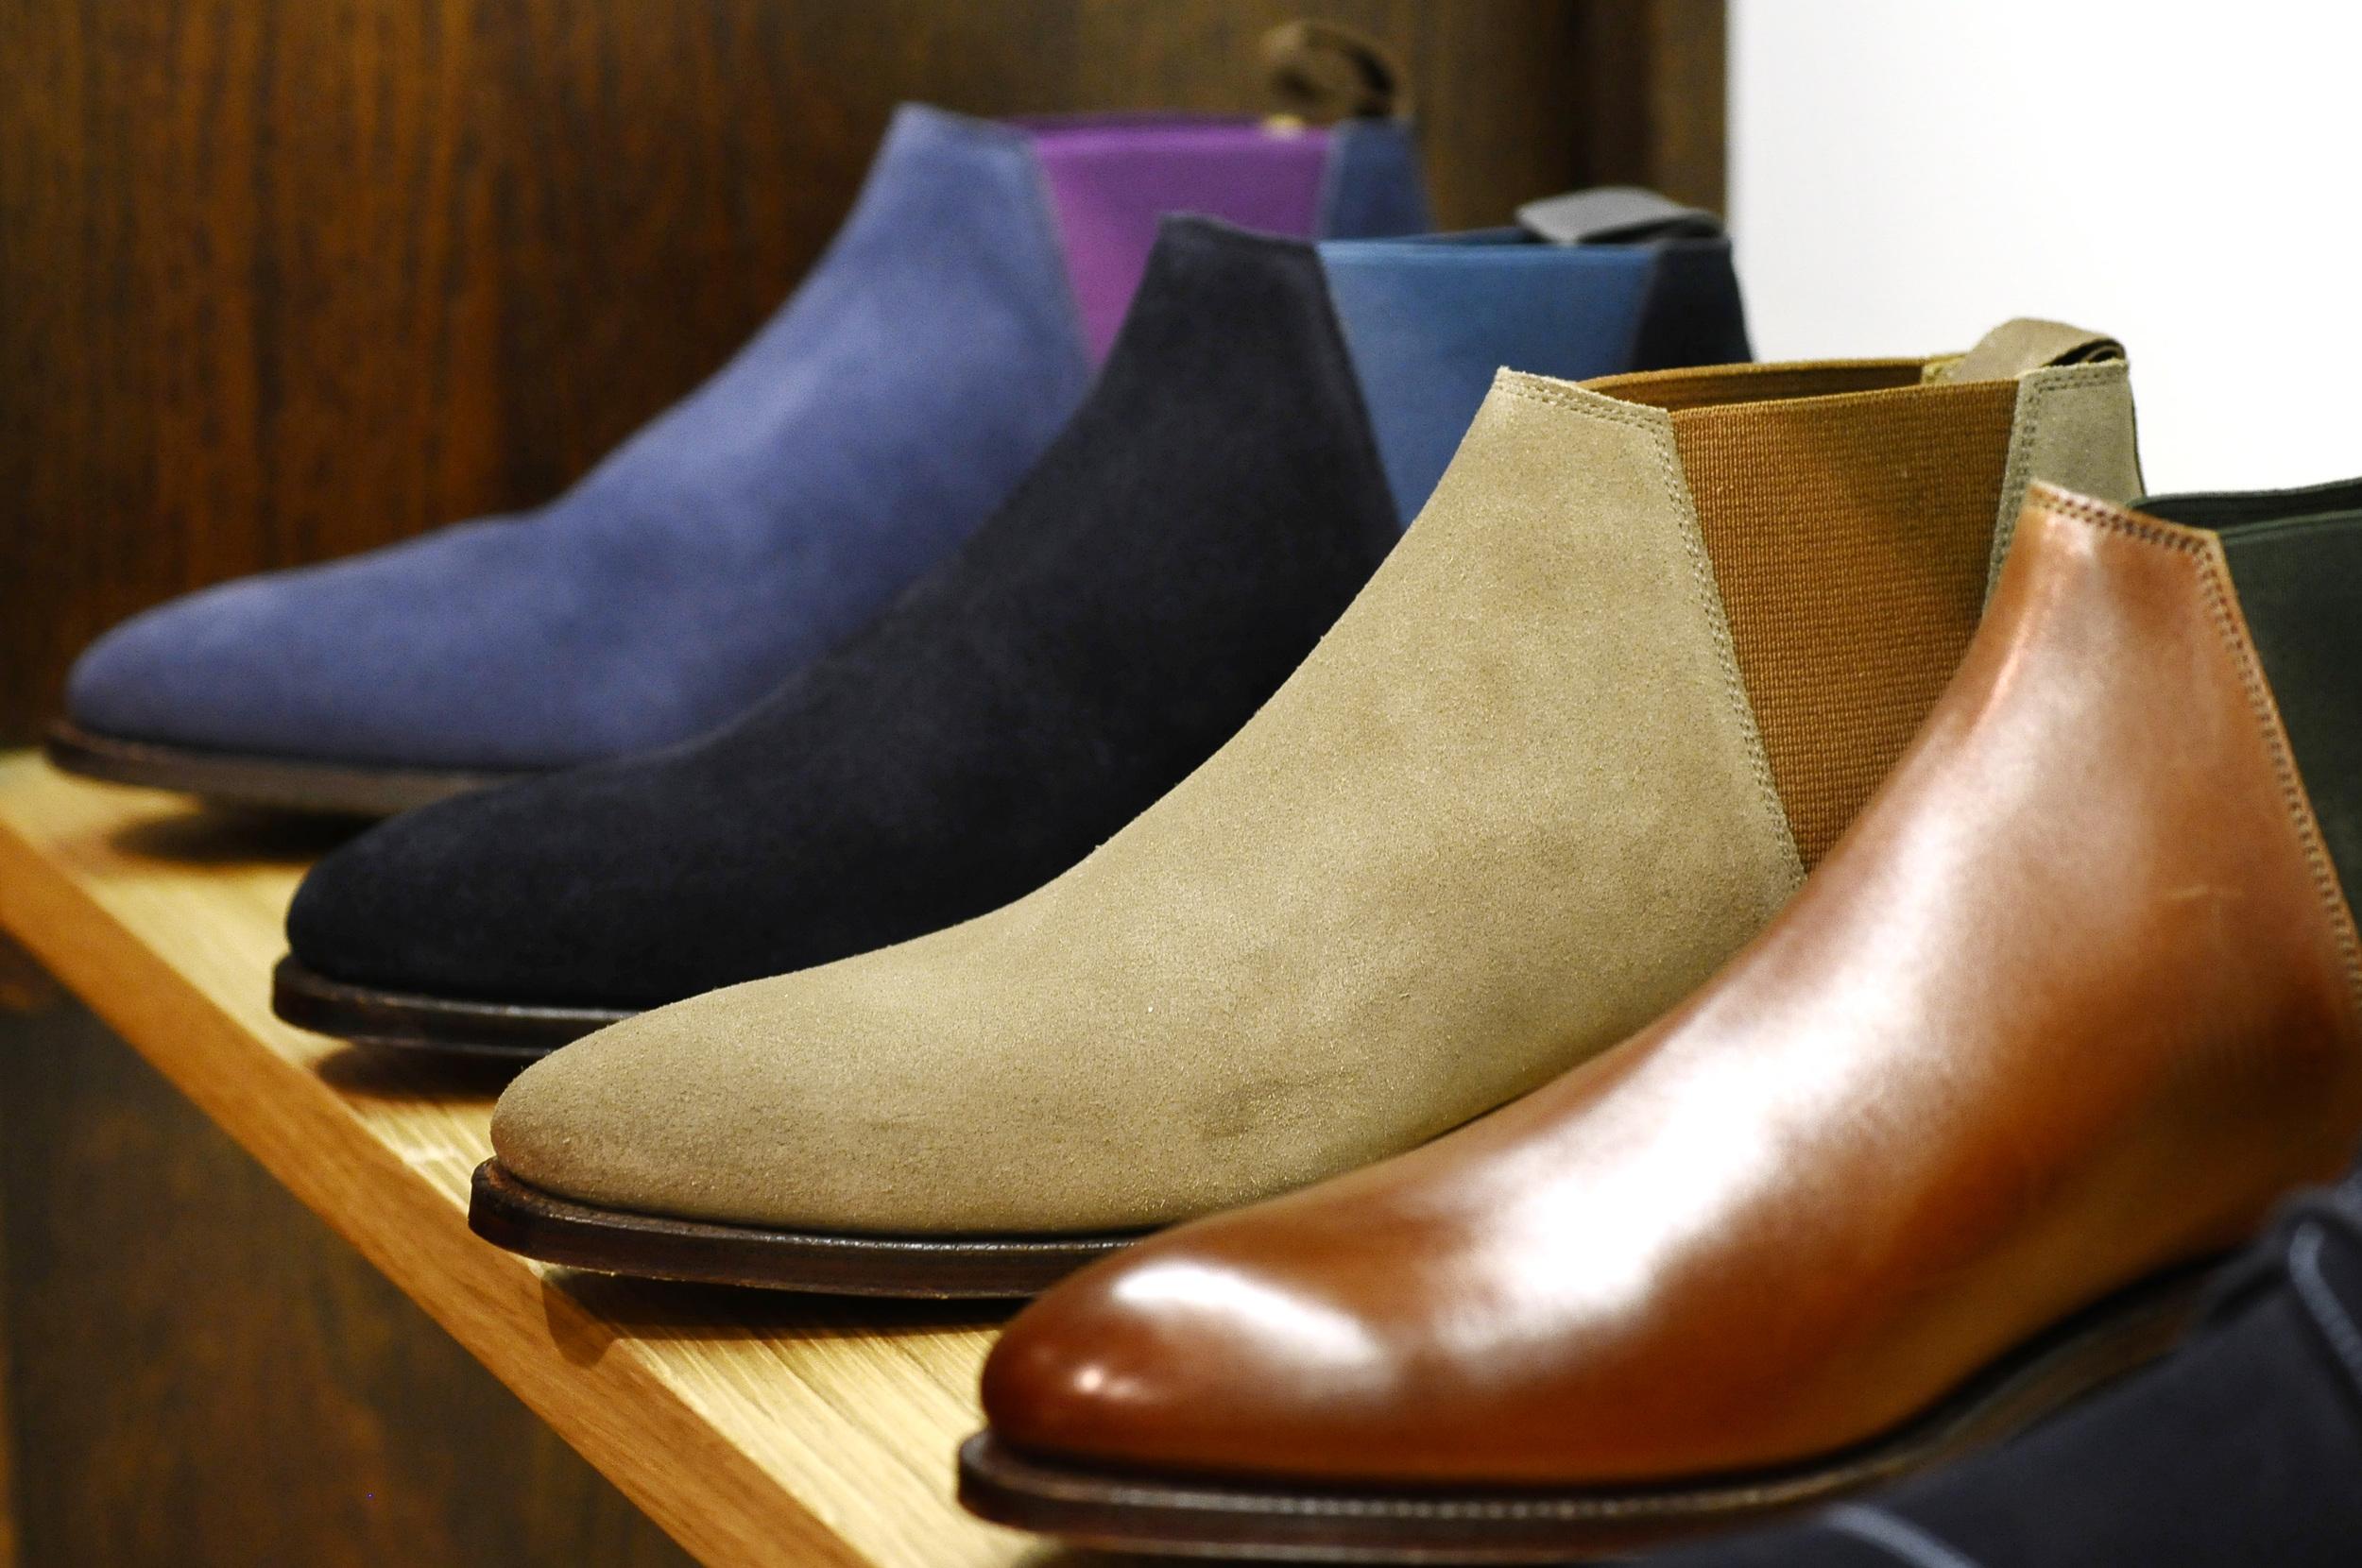 Stylish retro boots by CROCKETT & JONES